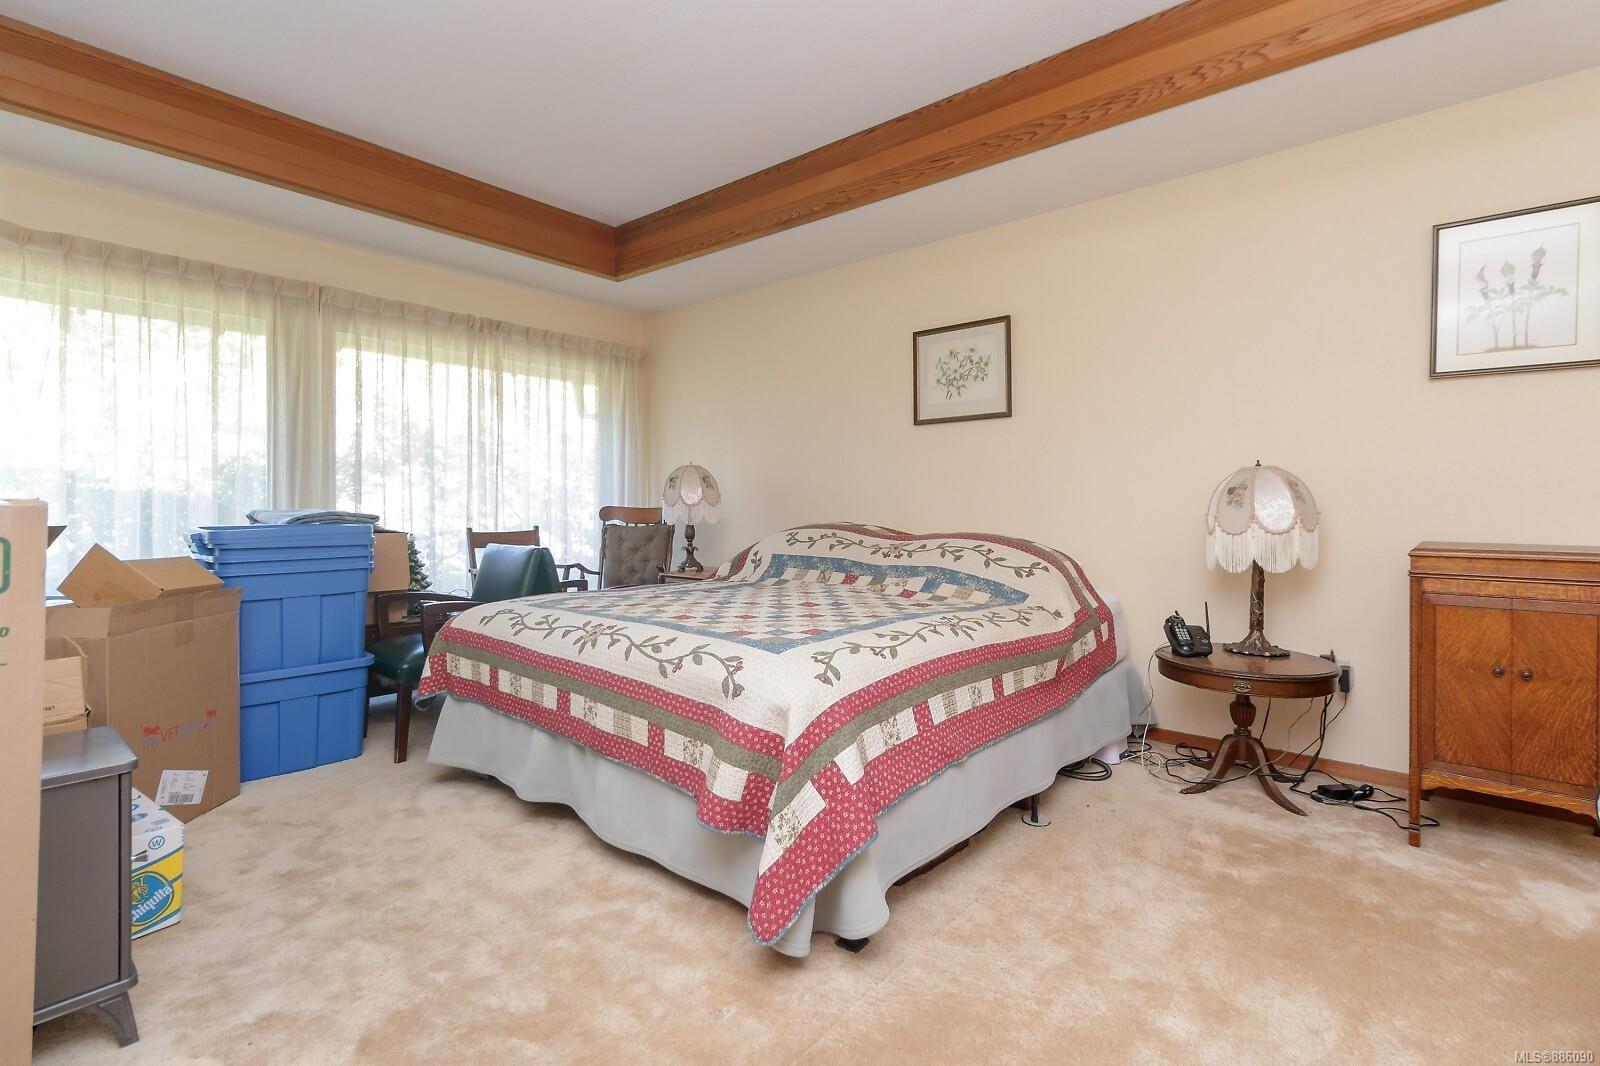 Photo 18: Photos: 4553 Blenkinsop Rd in : SE Blenkinsop House for sale (Saanich East)  : MLS®# 886090